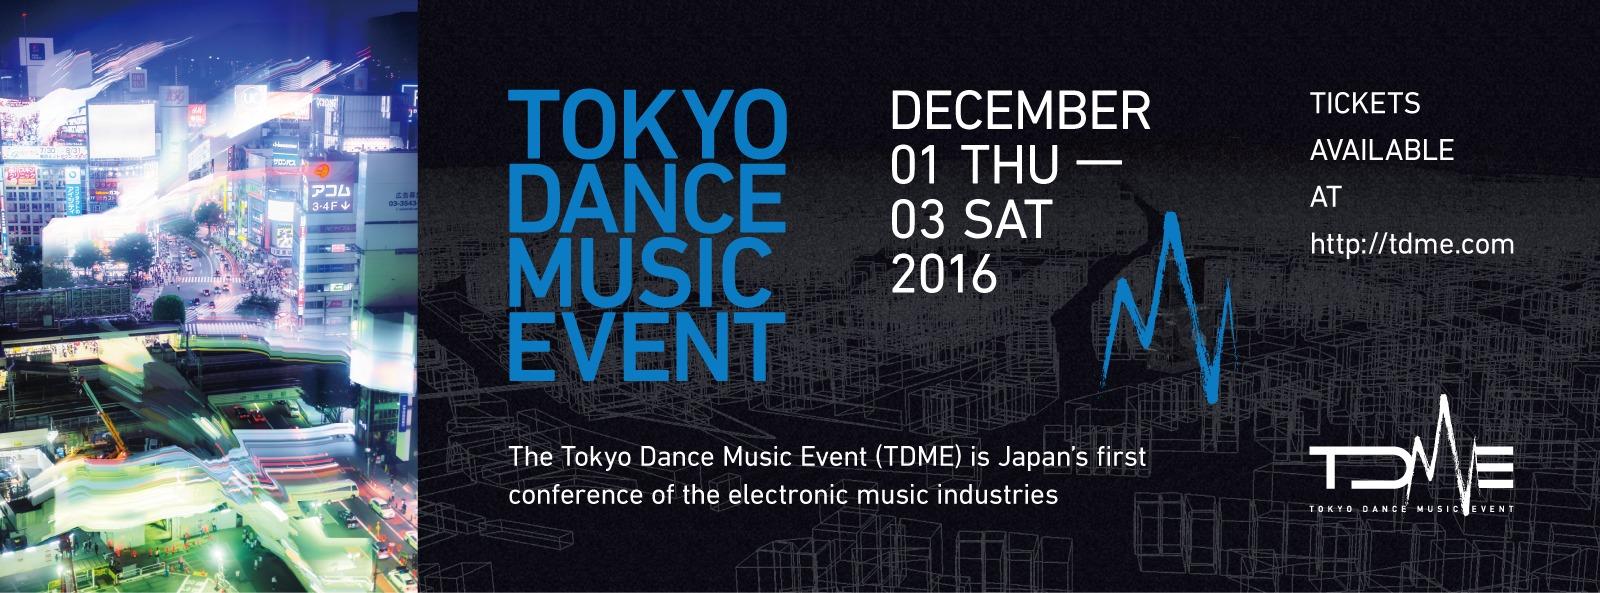 『TOKYO DANCE MUSIC EVENT』